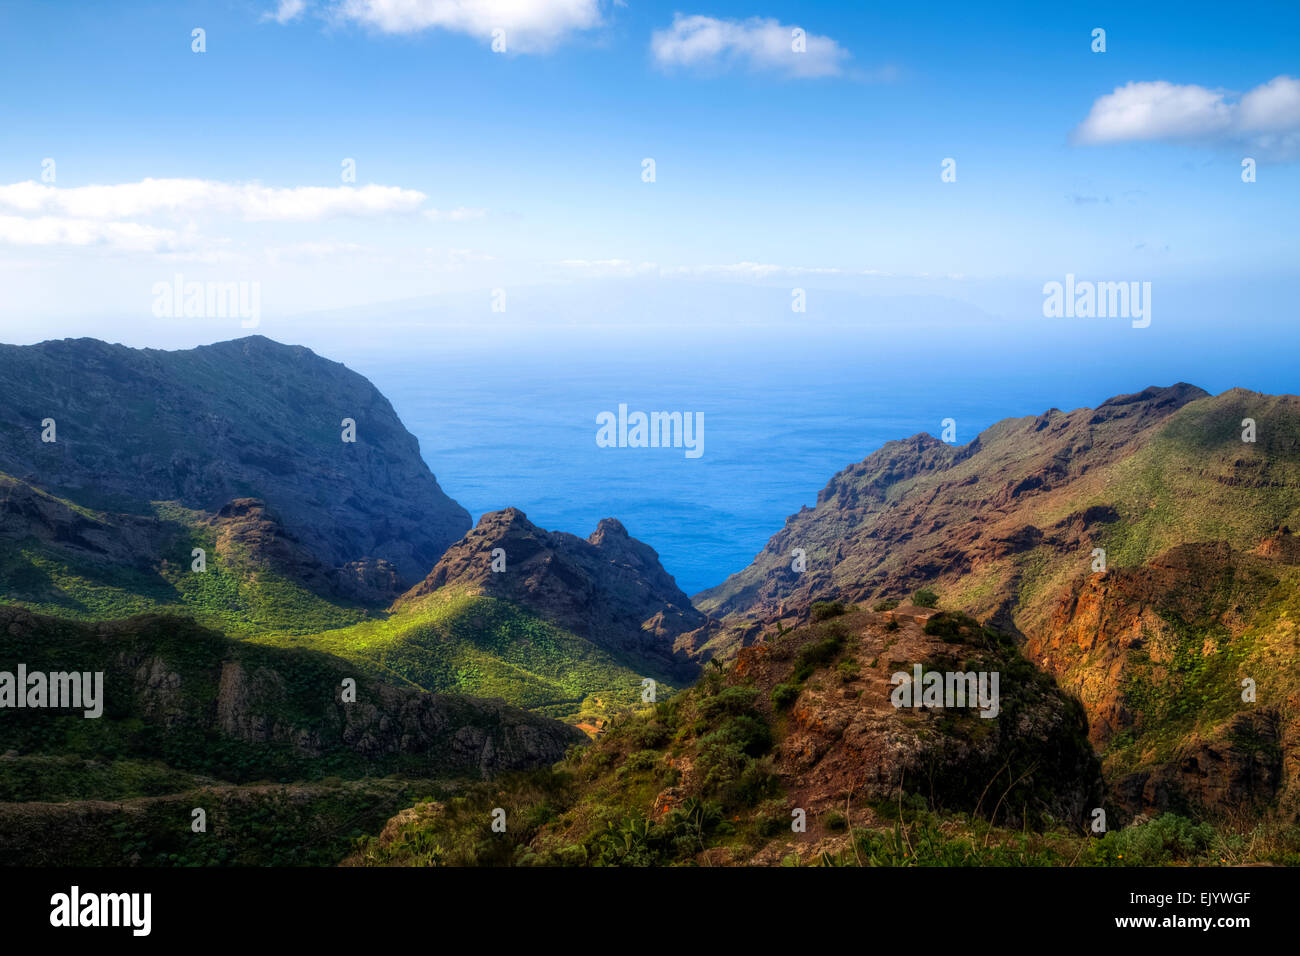 Teneriffa, Masca, Teno-Massivs, Kanarische Inseln, Spanien Stockfoto